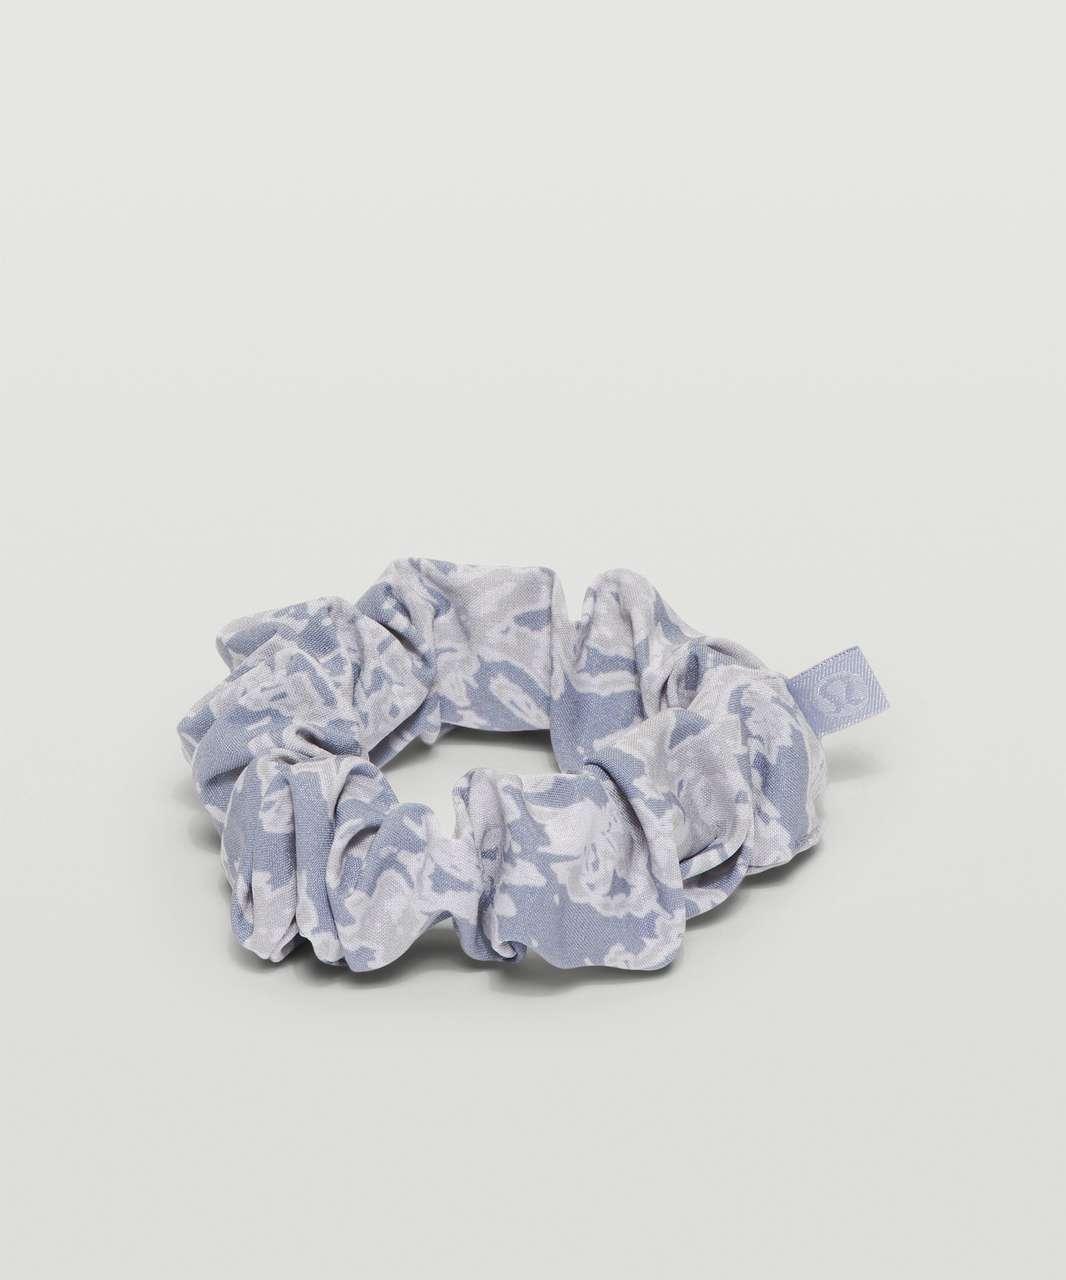 Lululemon Uplifting Scrunchie - Motion Blur Mini Multi